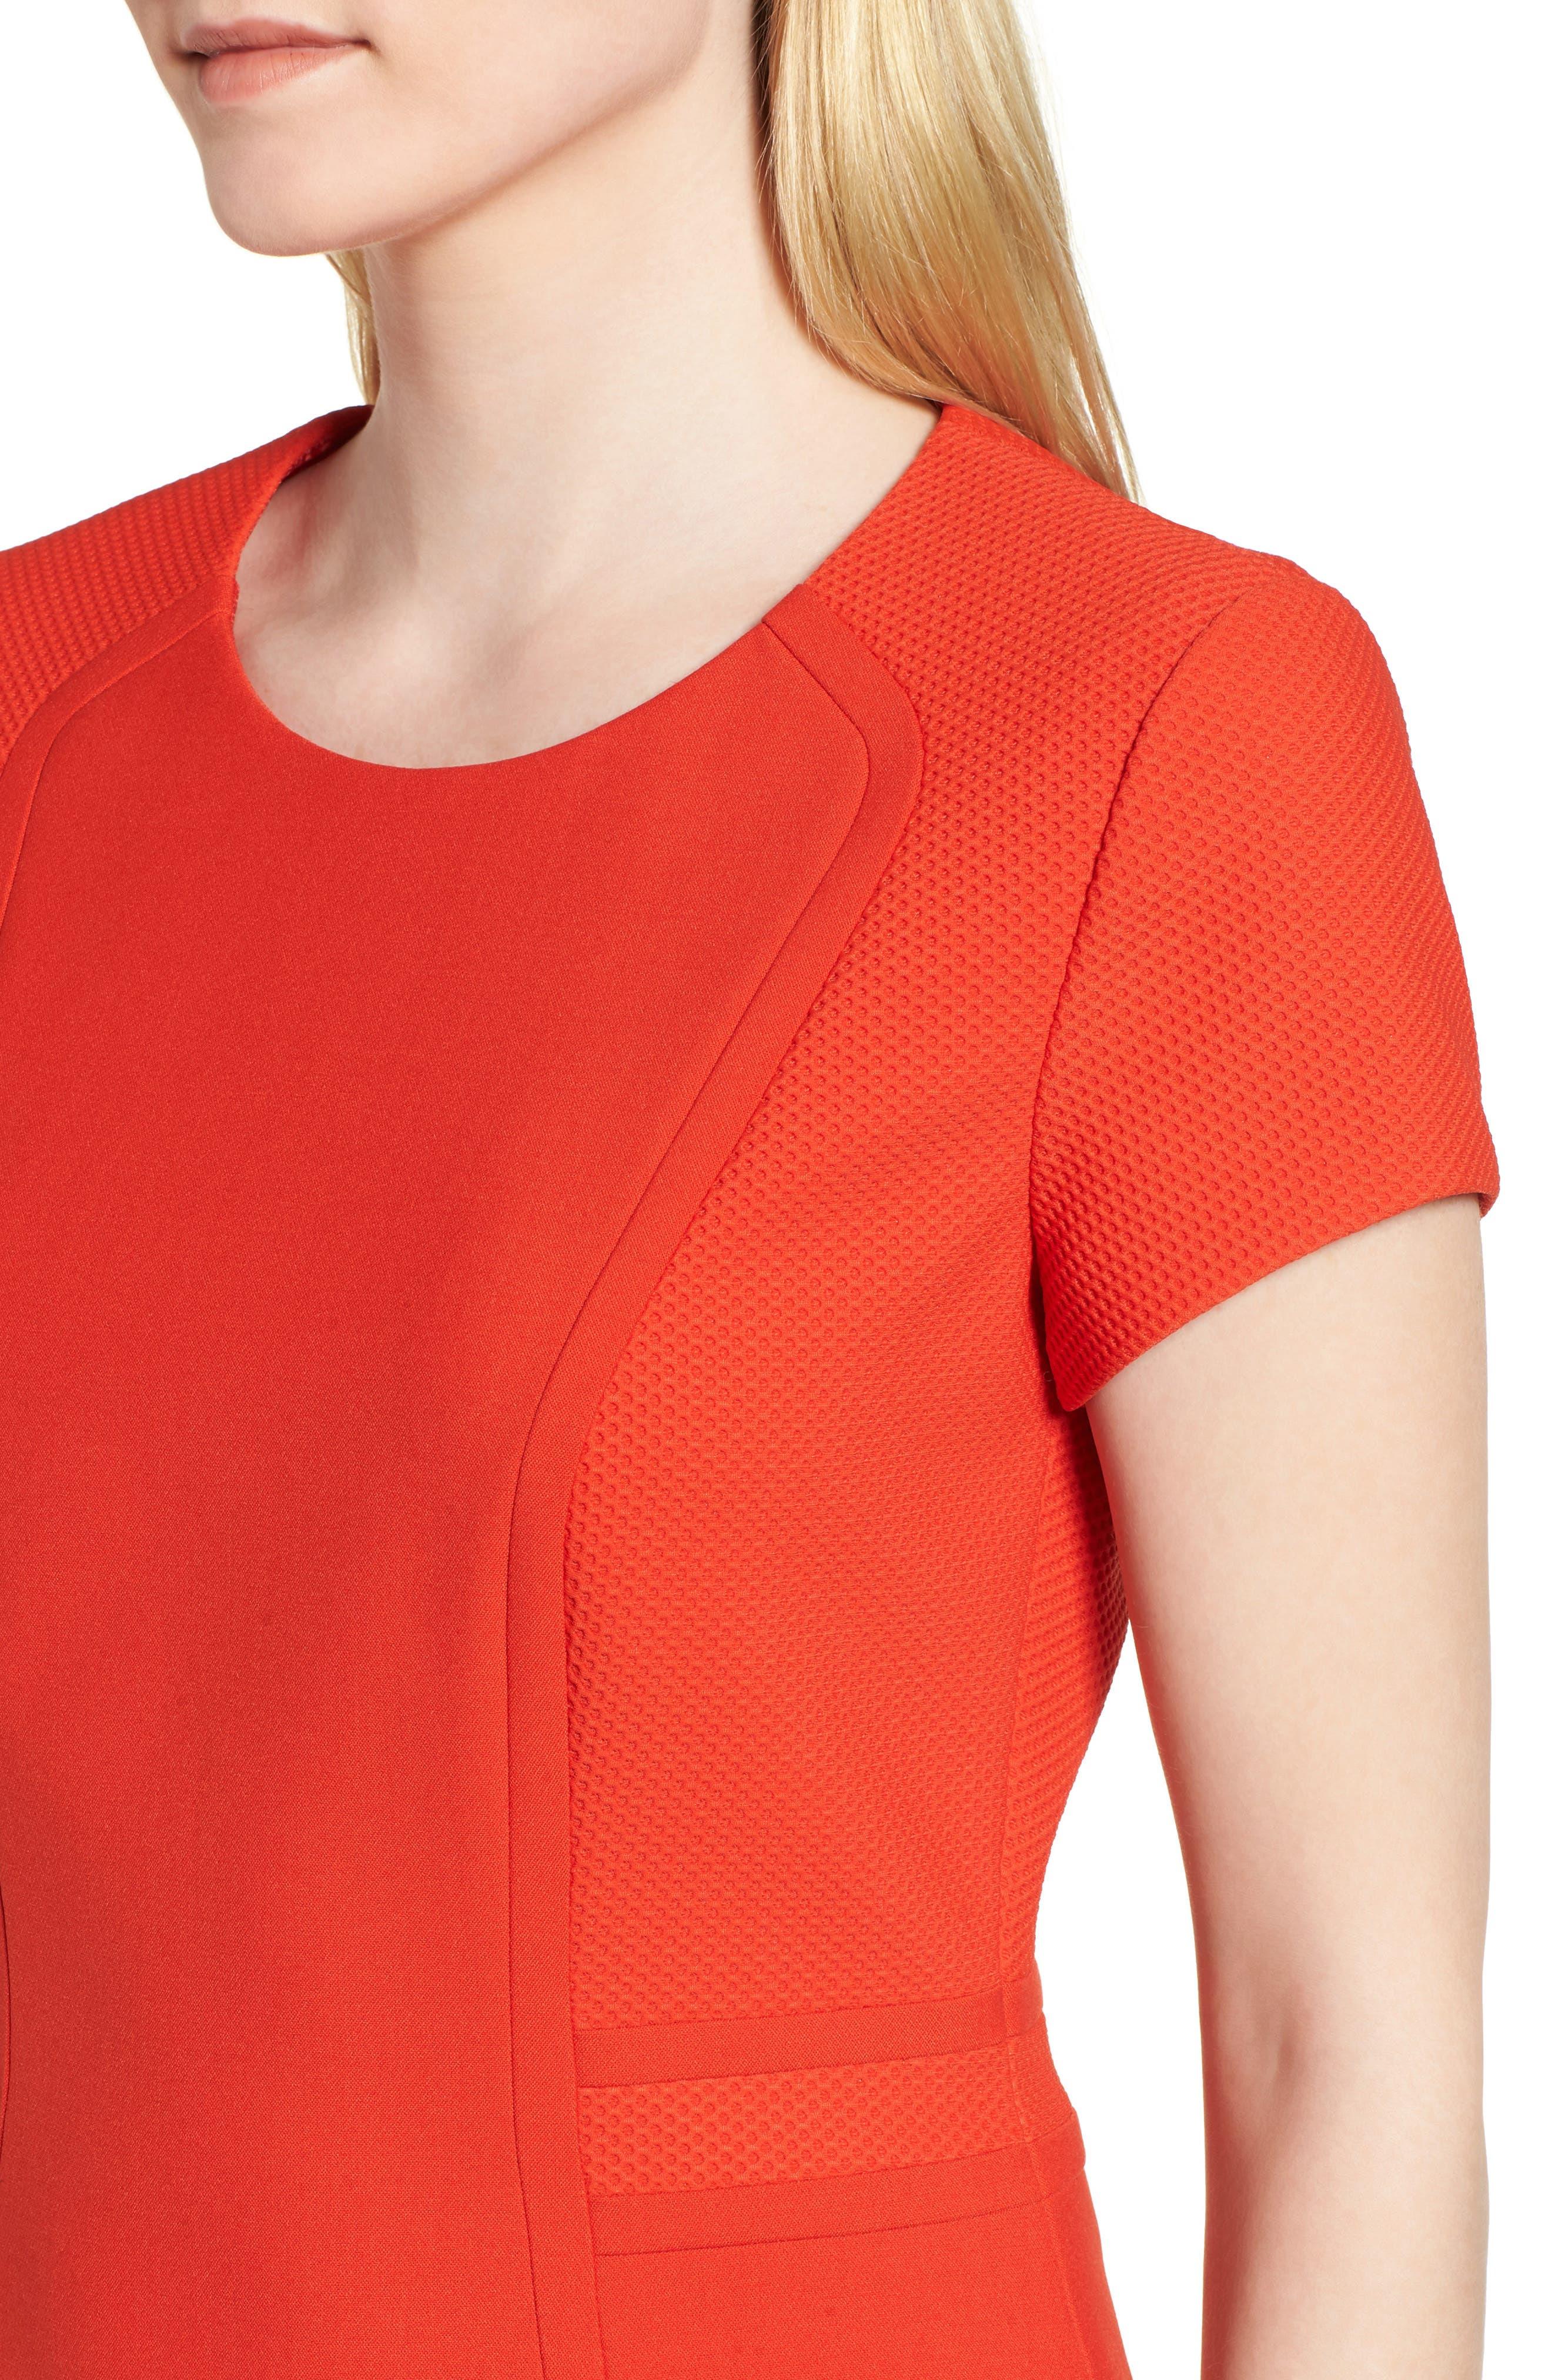 Idama Ponte Top,                             Alternate thumbnail 4, color,                             Sunset Orange